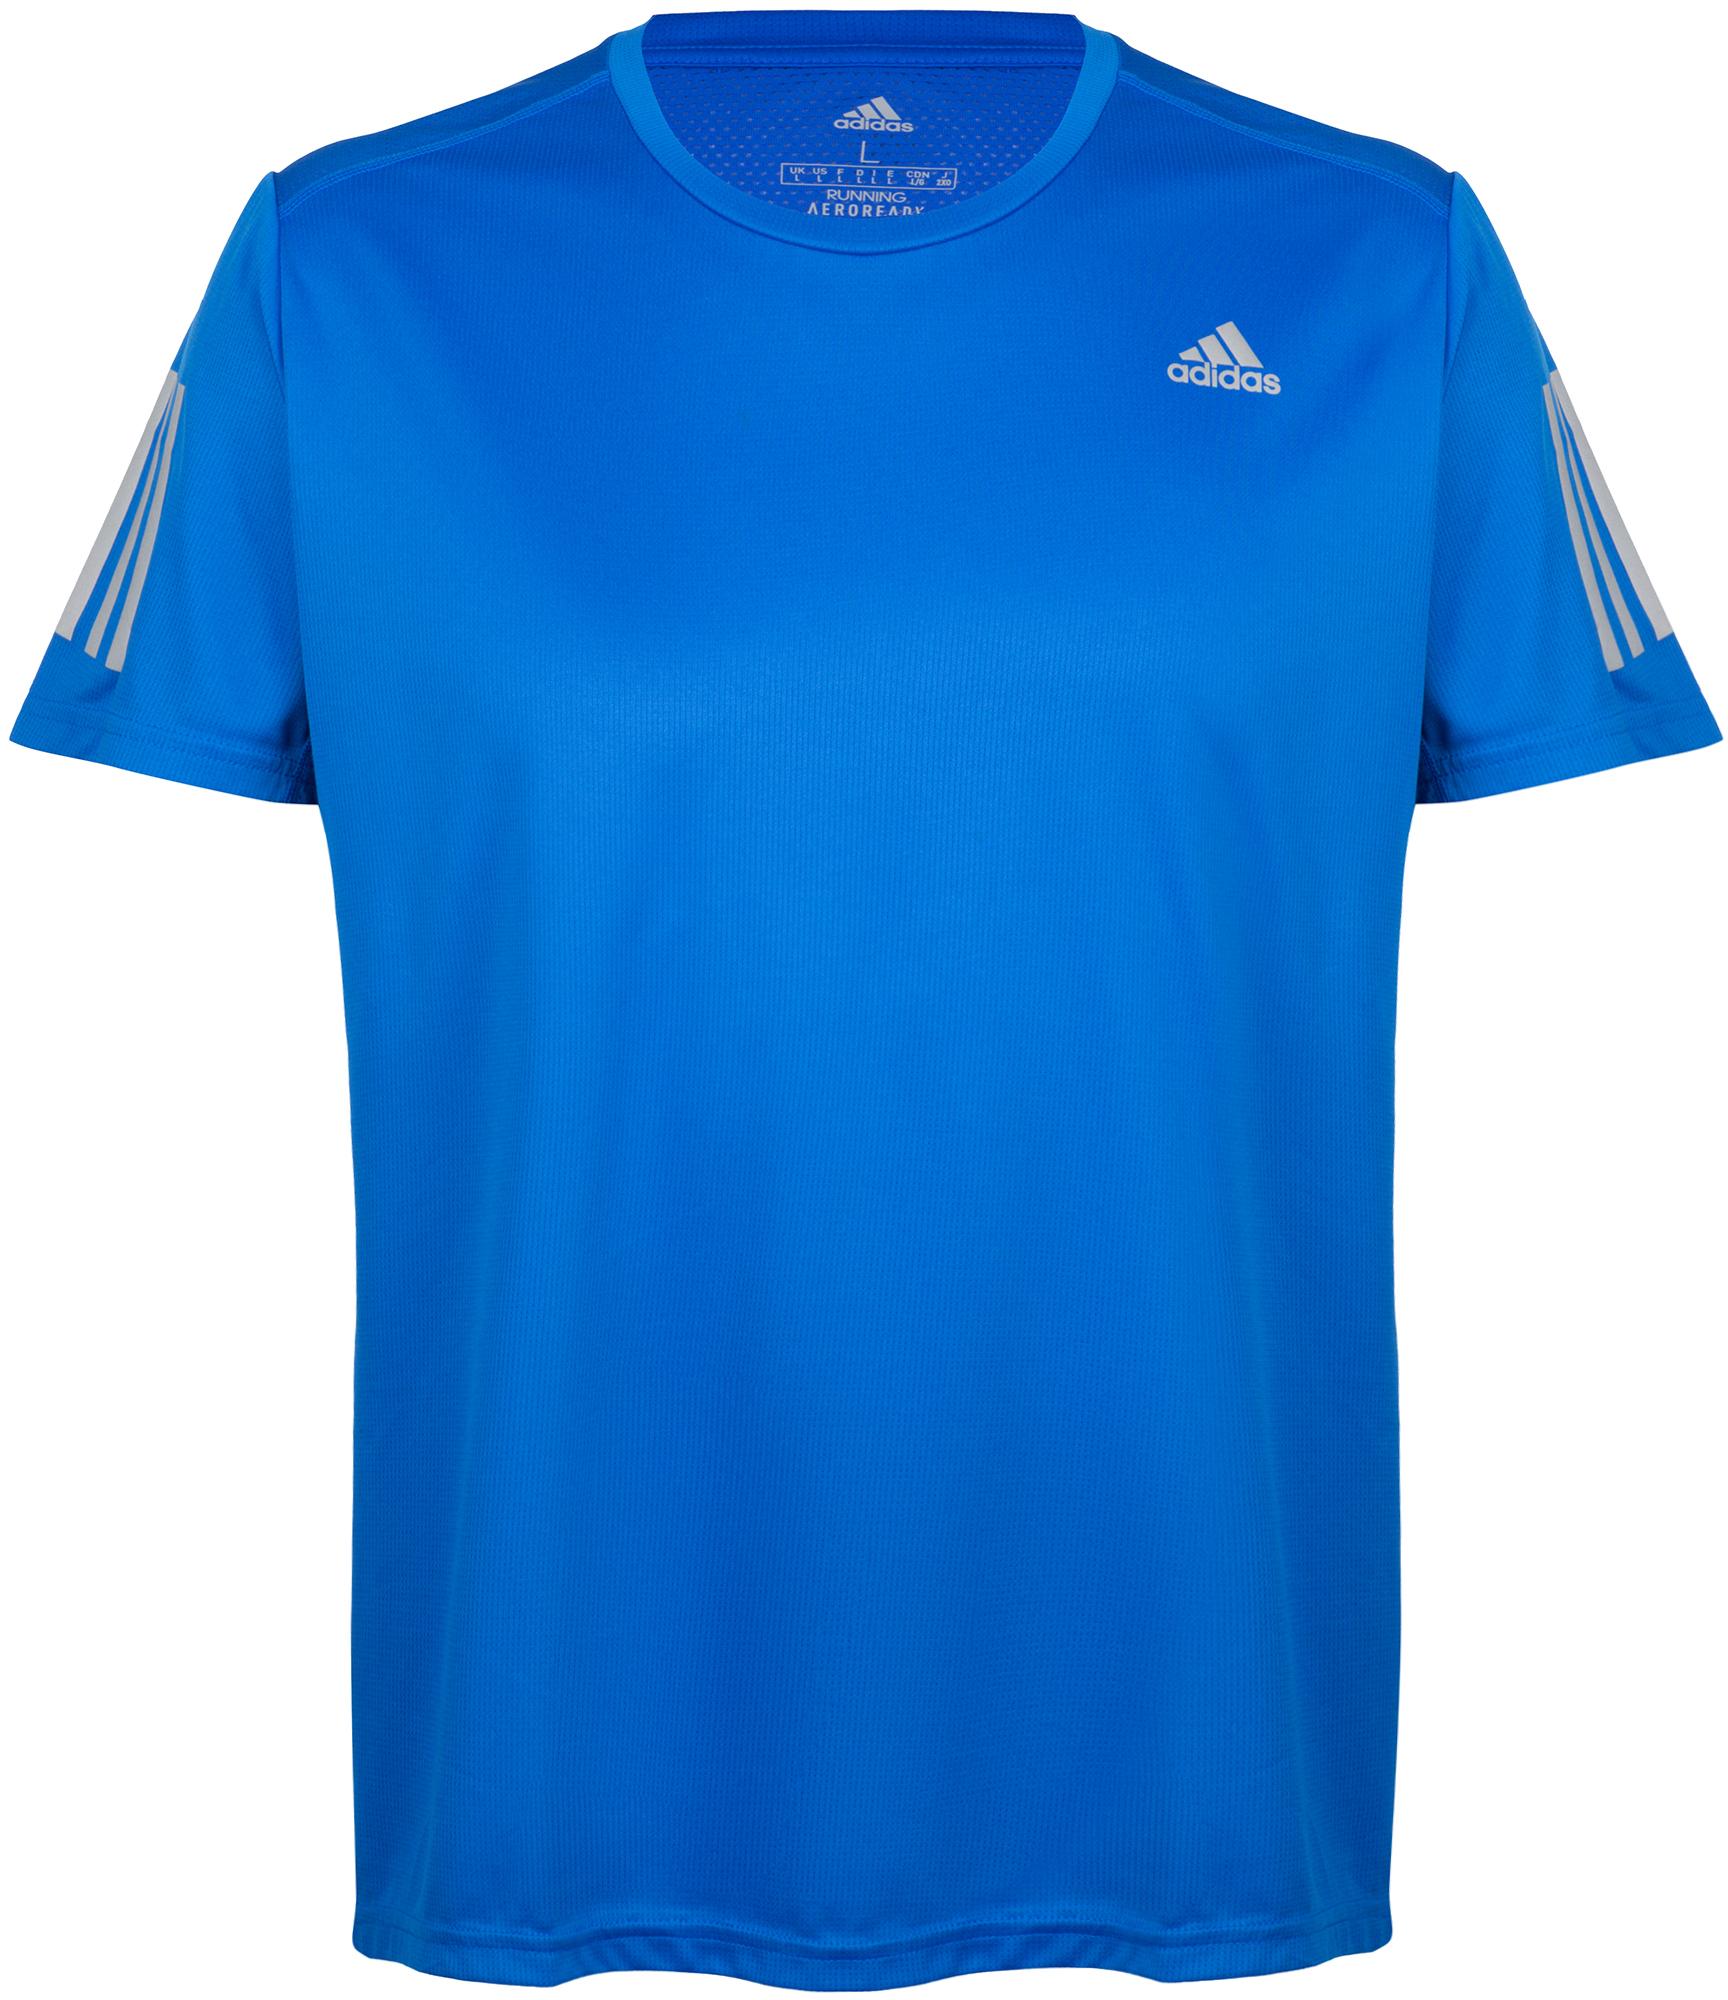 Фото - Adidas Футболка мужская adidas Own the Run, размер 56-58 футболка с длинными рукавами для бега run dry